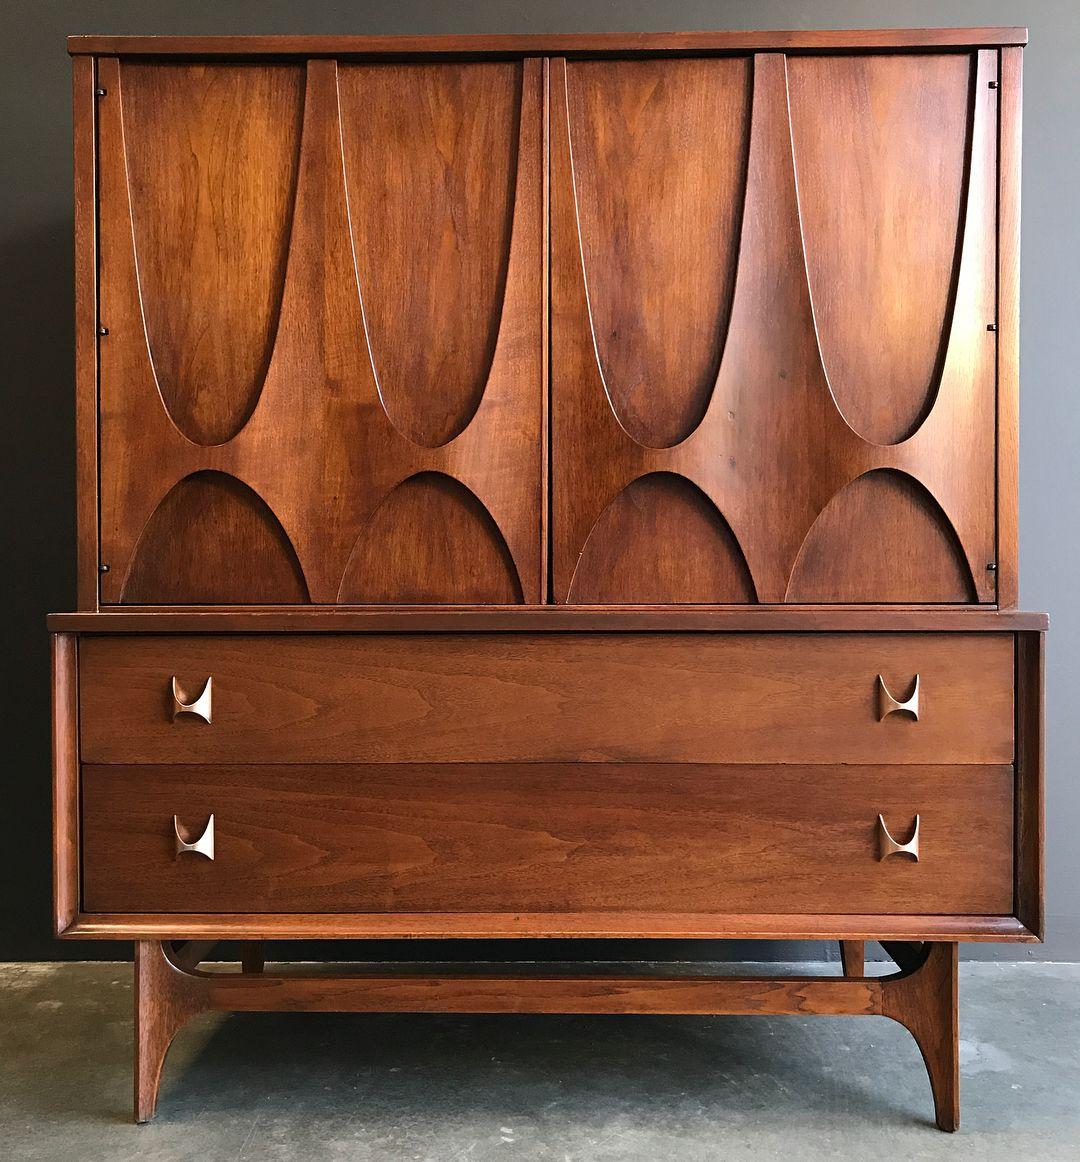 897 Likes 13 Comments Post War Modern Post War Modern On Instagram New Arri Mid Century Modern Furniture Mid Century Modern Decor Mid Century Furniture